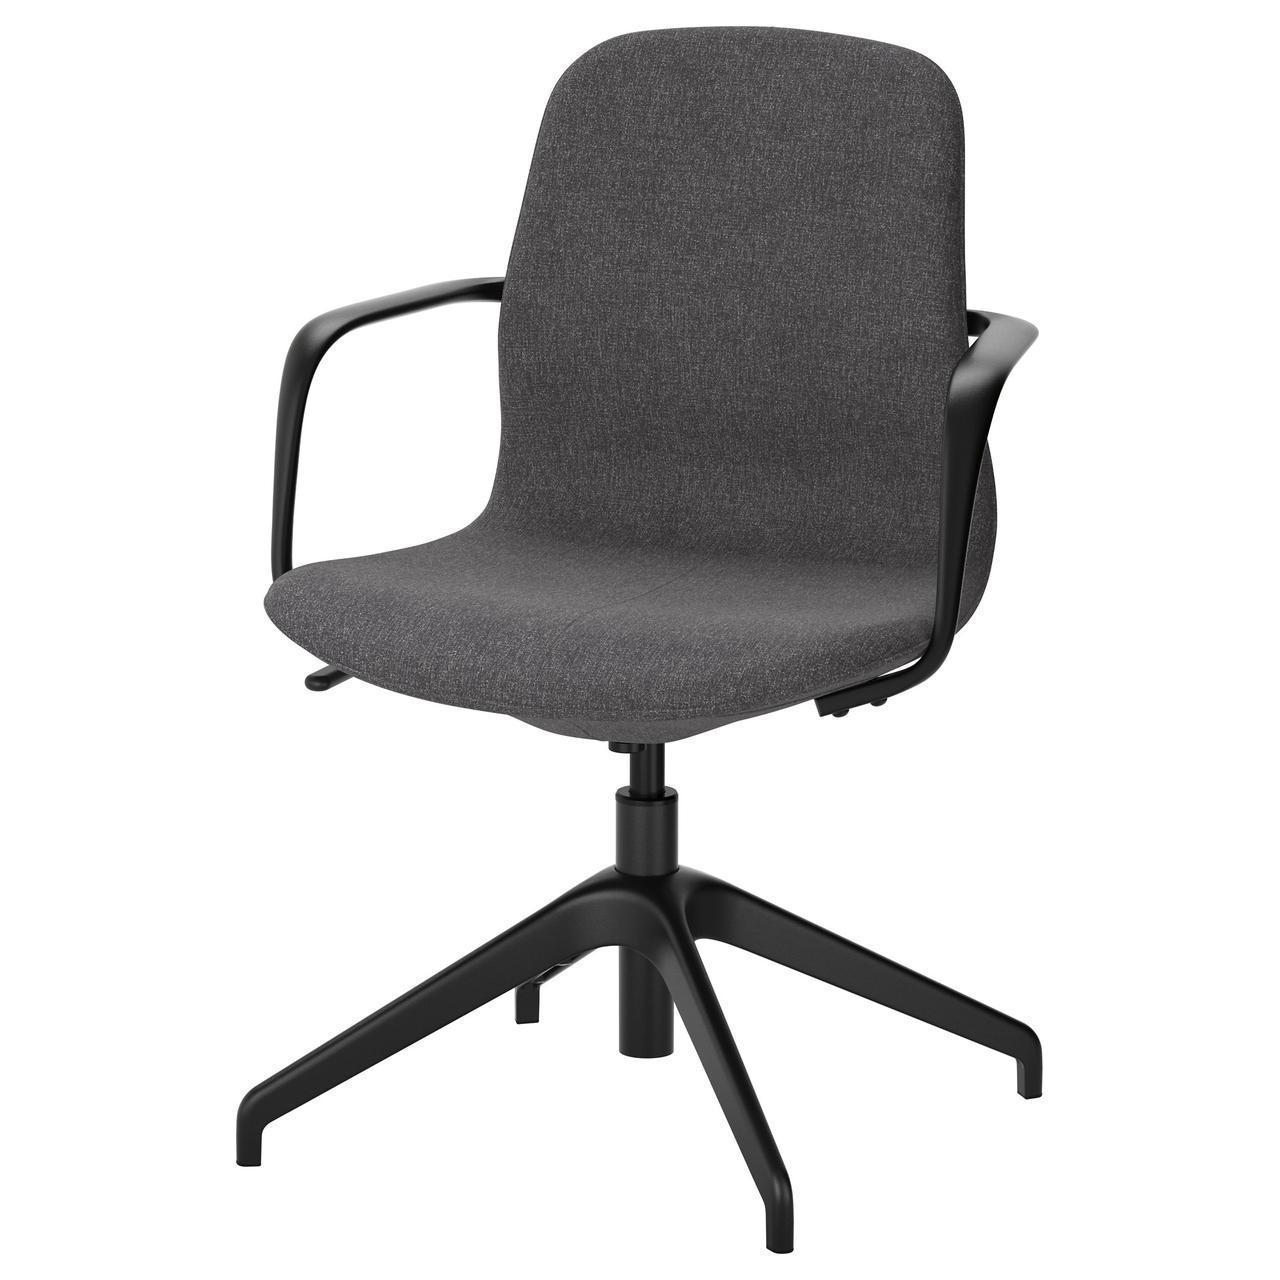 IKEA LANGFJALL Рабочий стул, темно-серый, черный  (991.762.22)